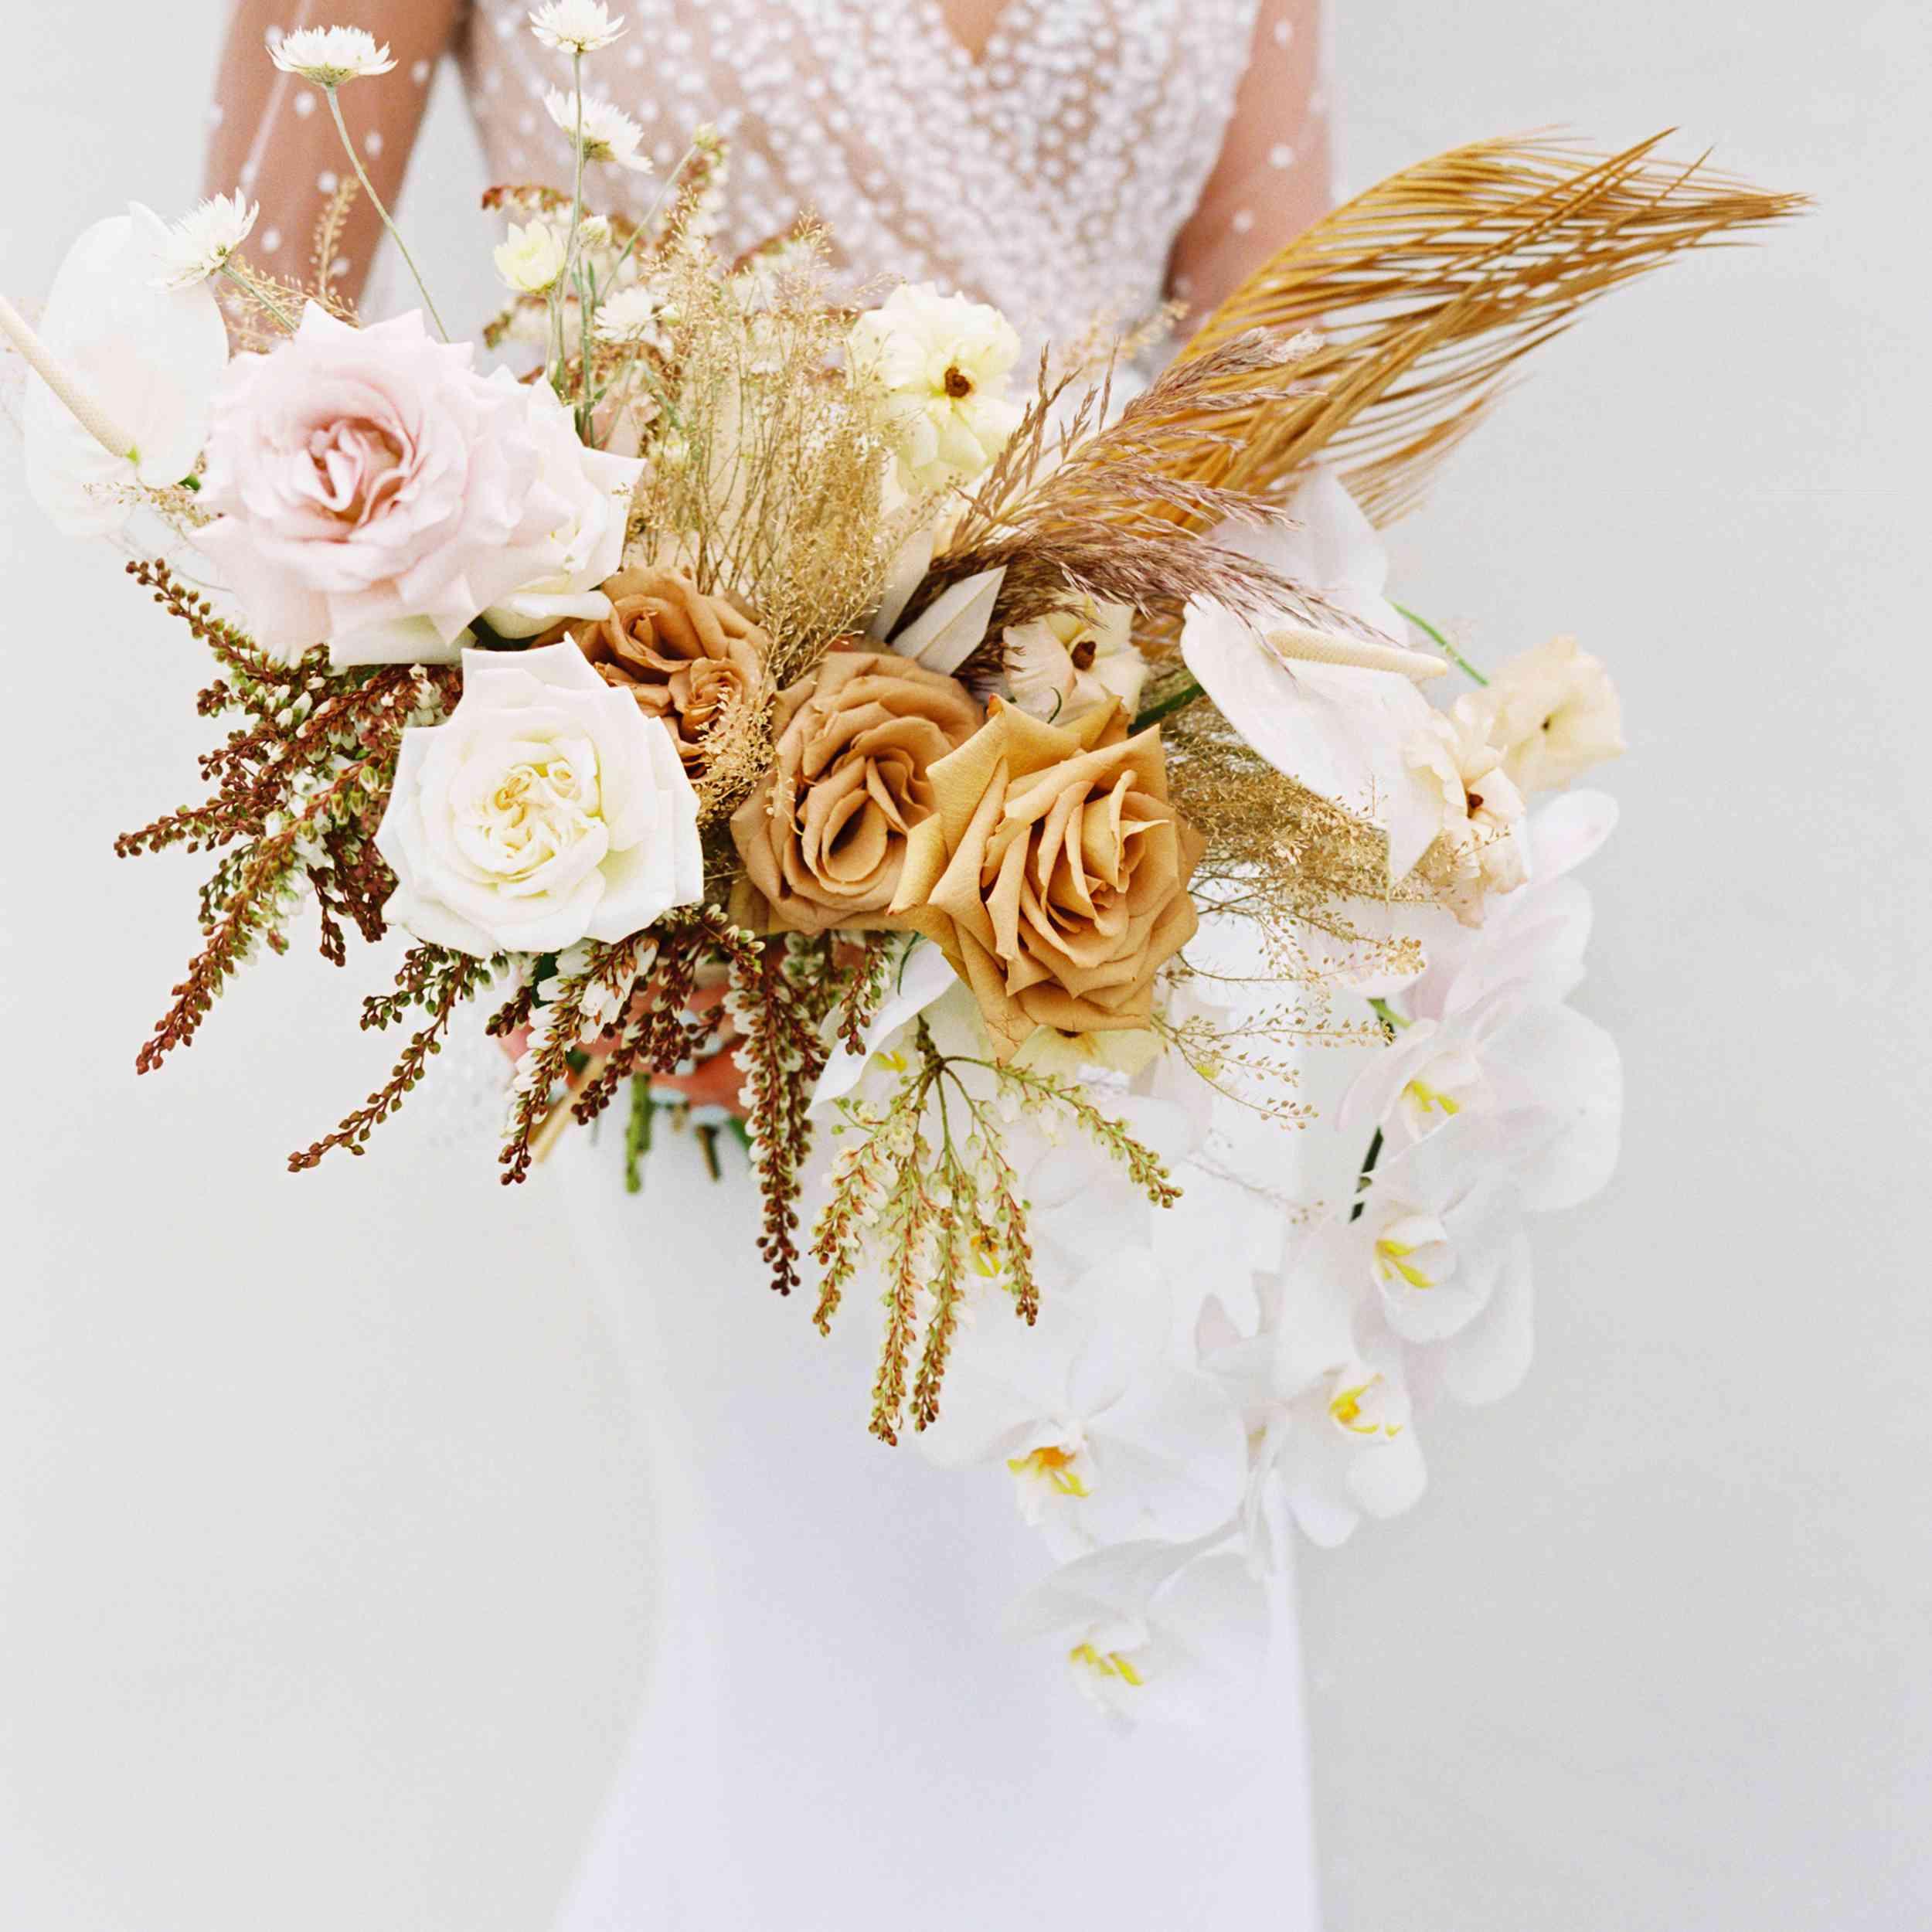 Ribbon cascade Bride hand flower arrangement alternative Very light Crystal wired bridal bouquet Wedding keepsake. Wedding flowers